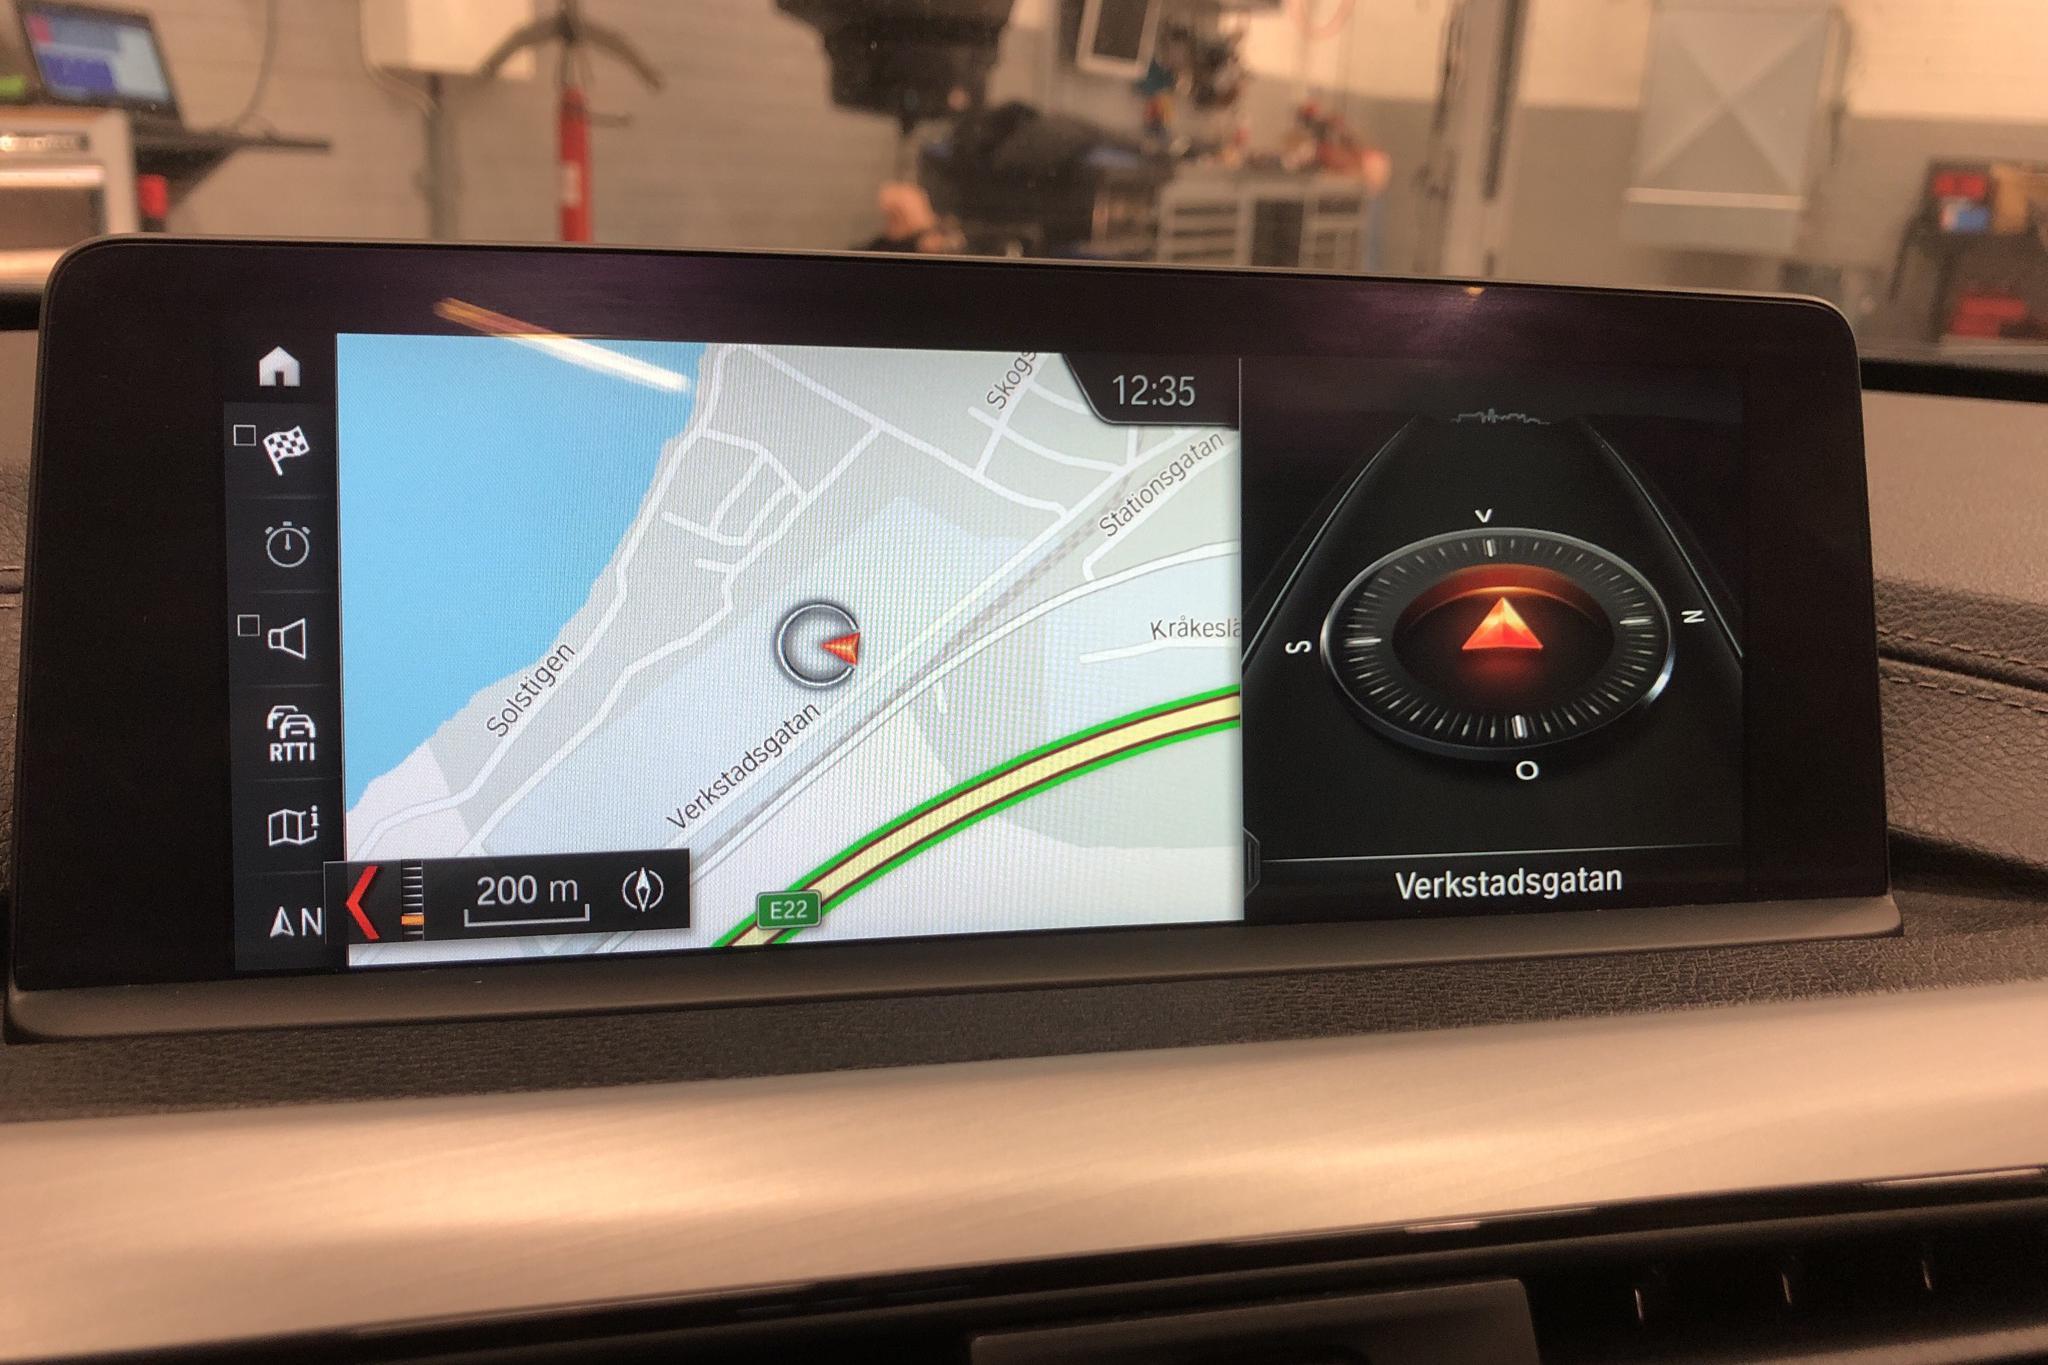 BMW 330e Sedan, F30 (252hk) - 123 380 km - Automatic - black - 2018